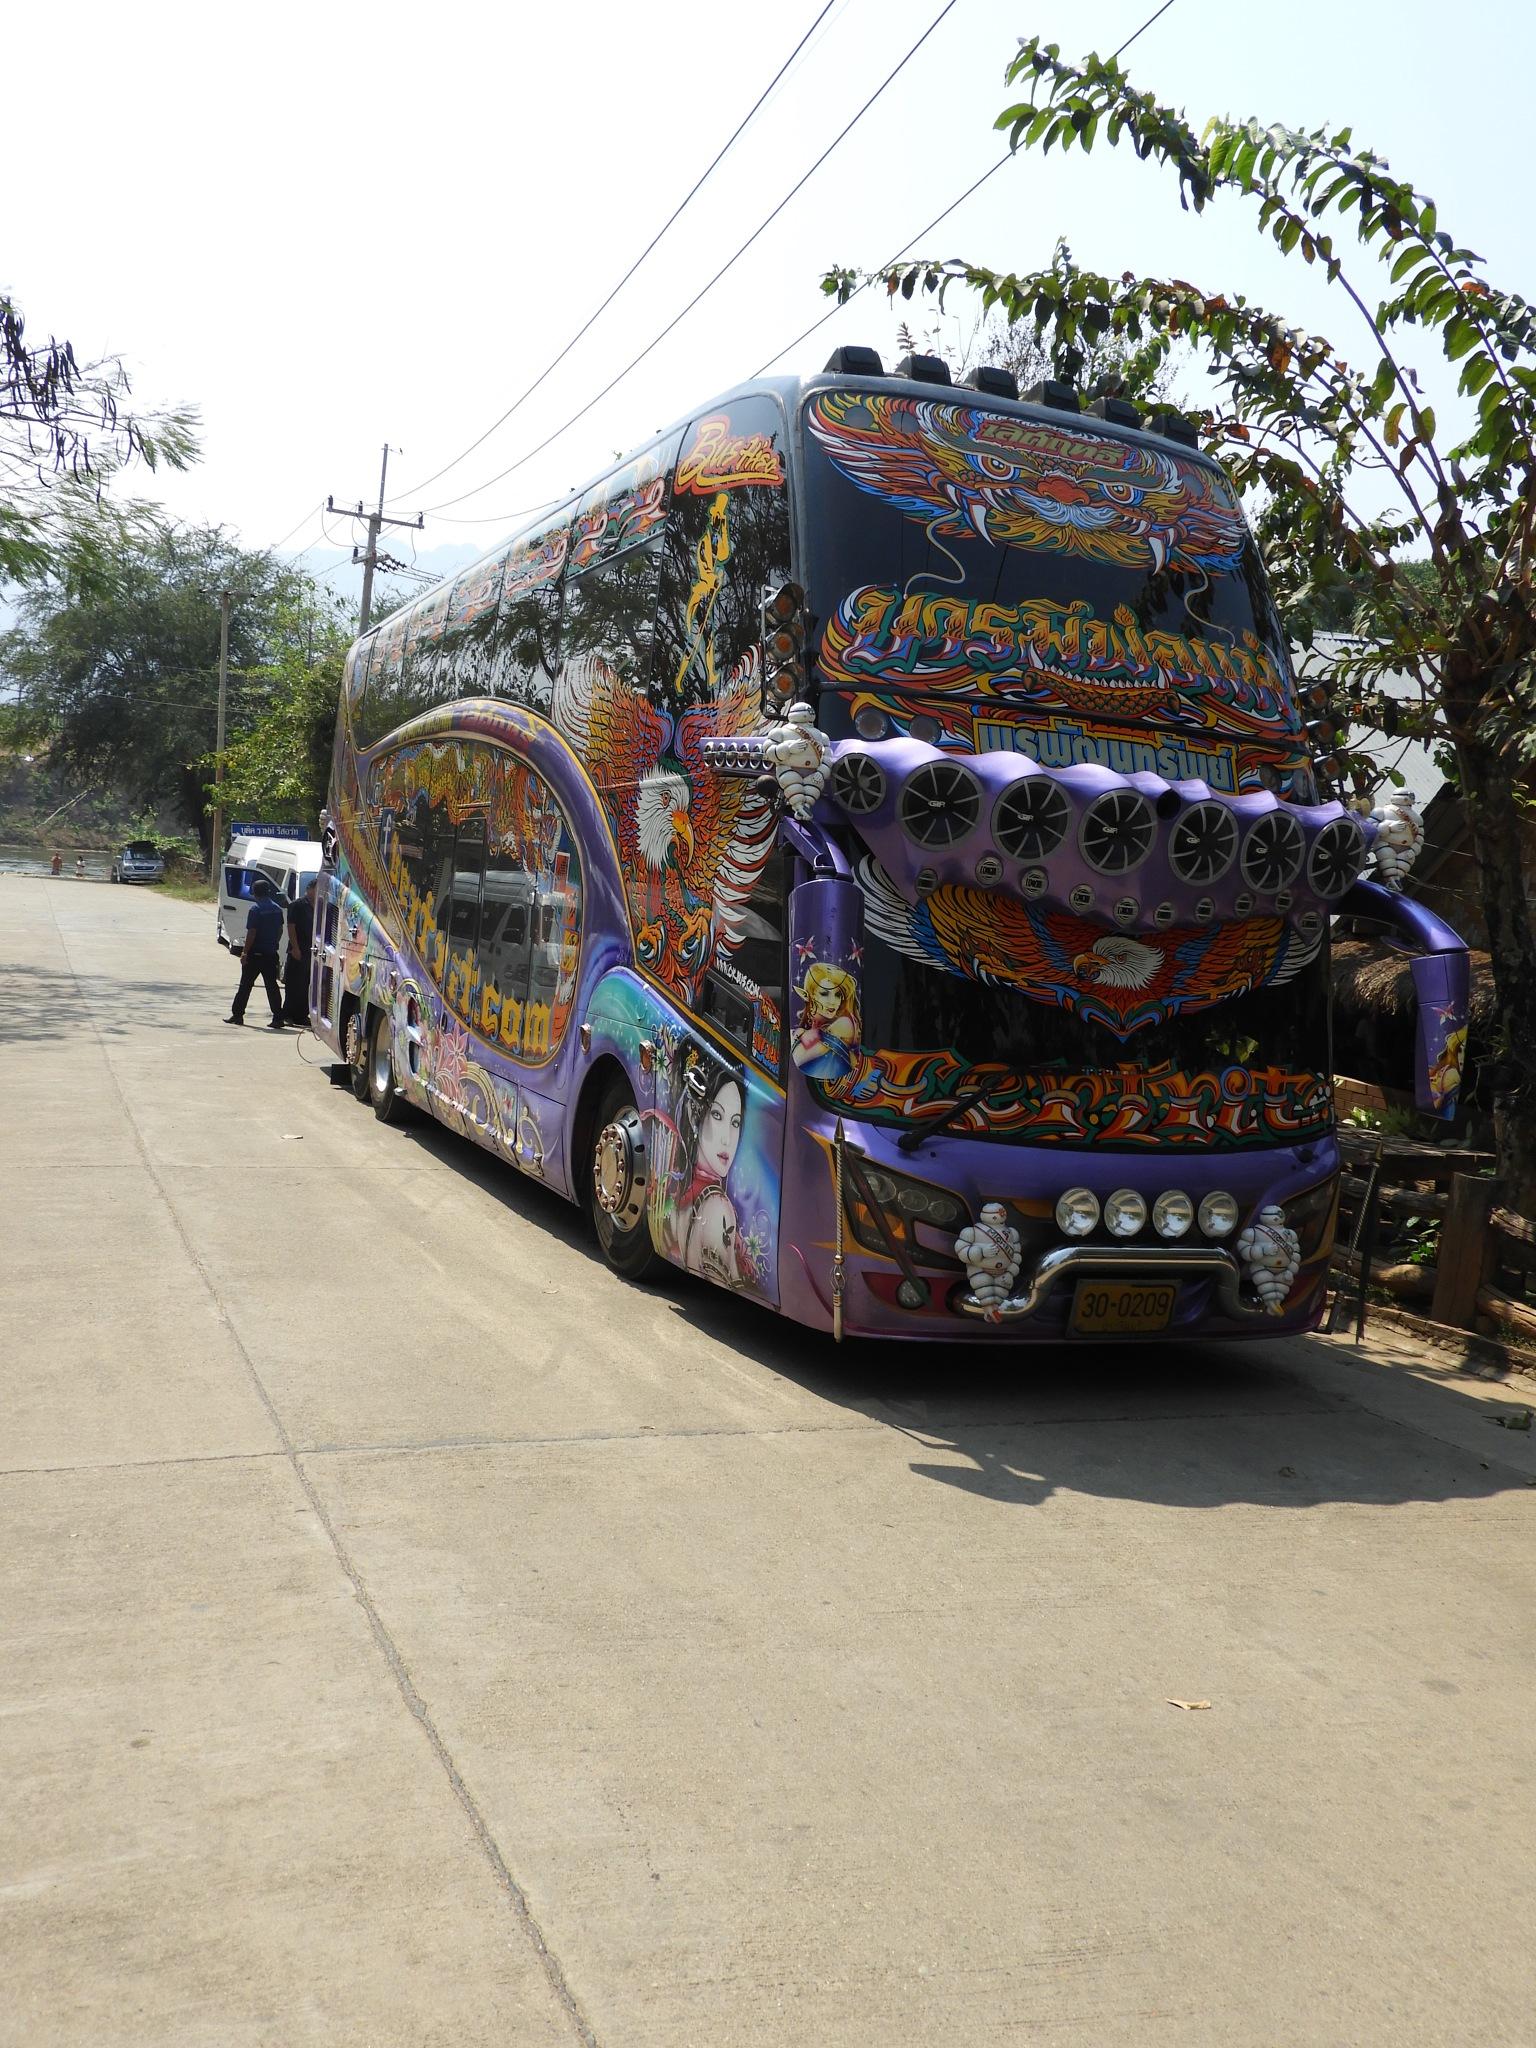 bus by Henny van Broekhoven